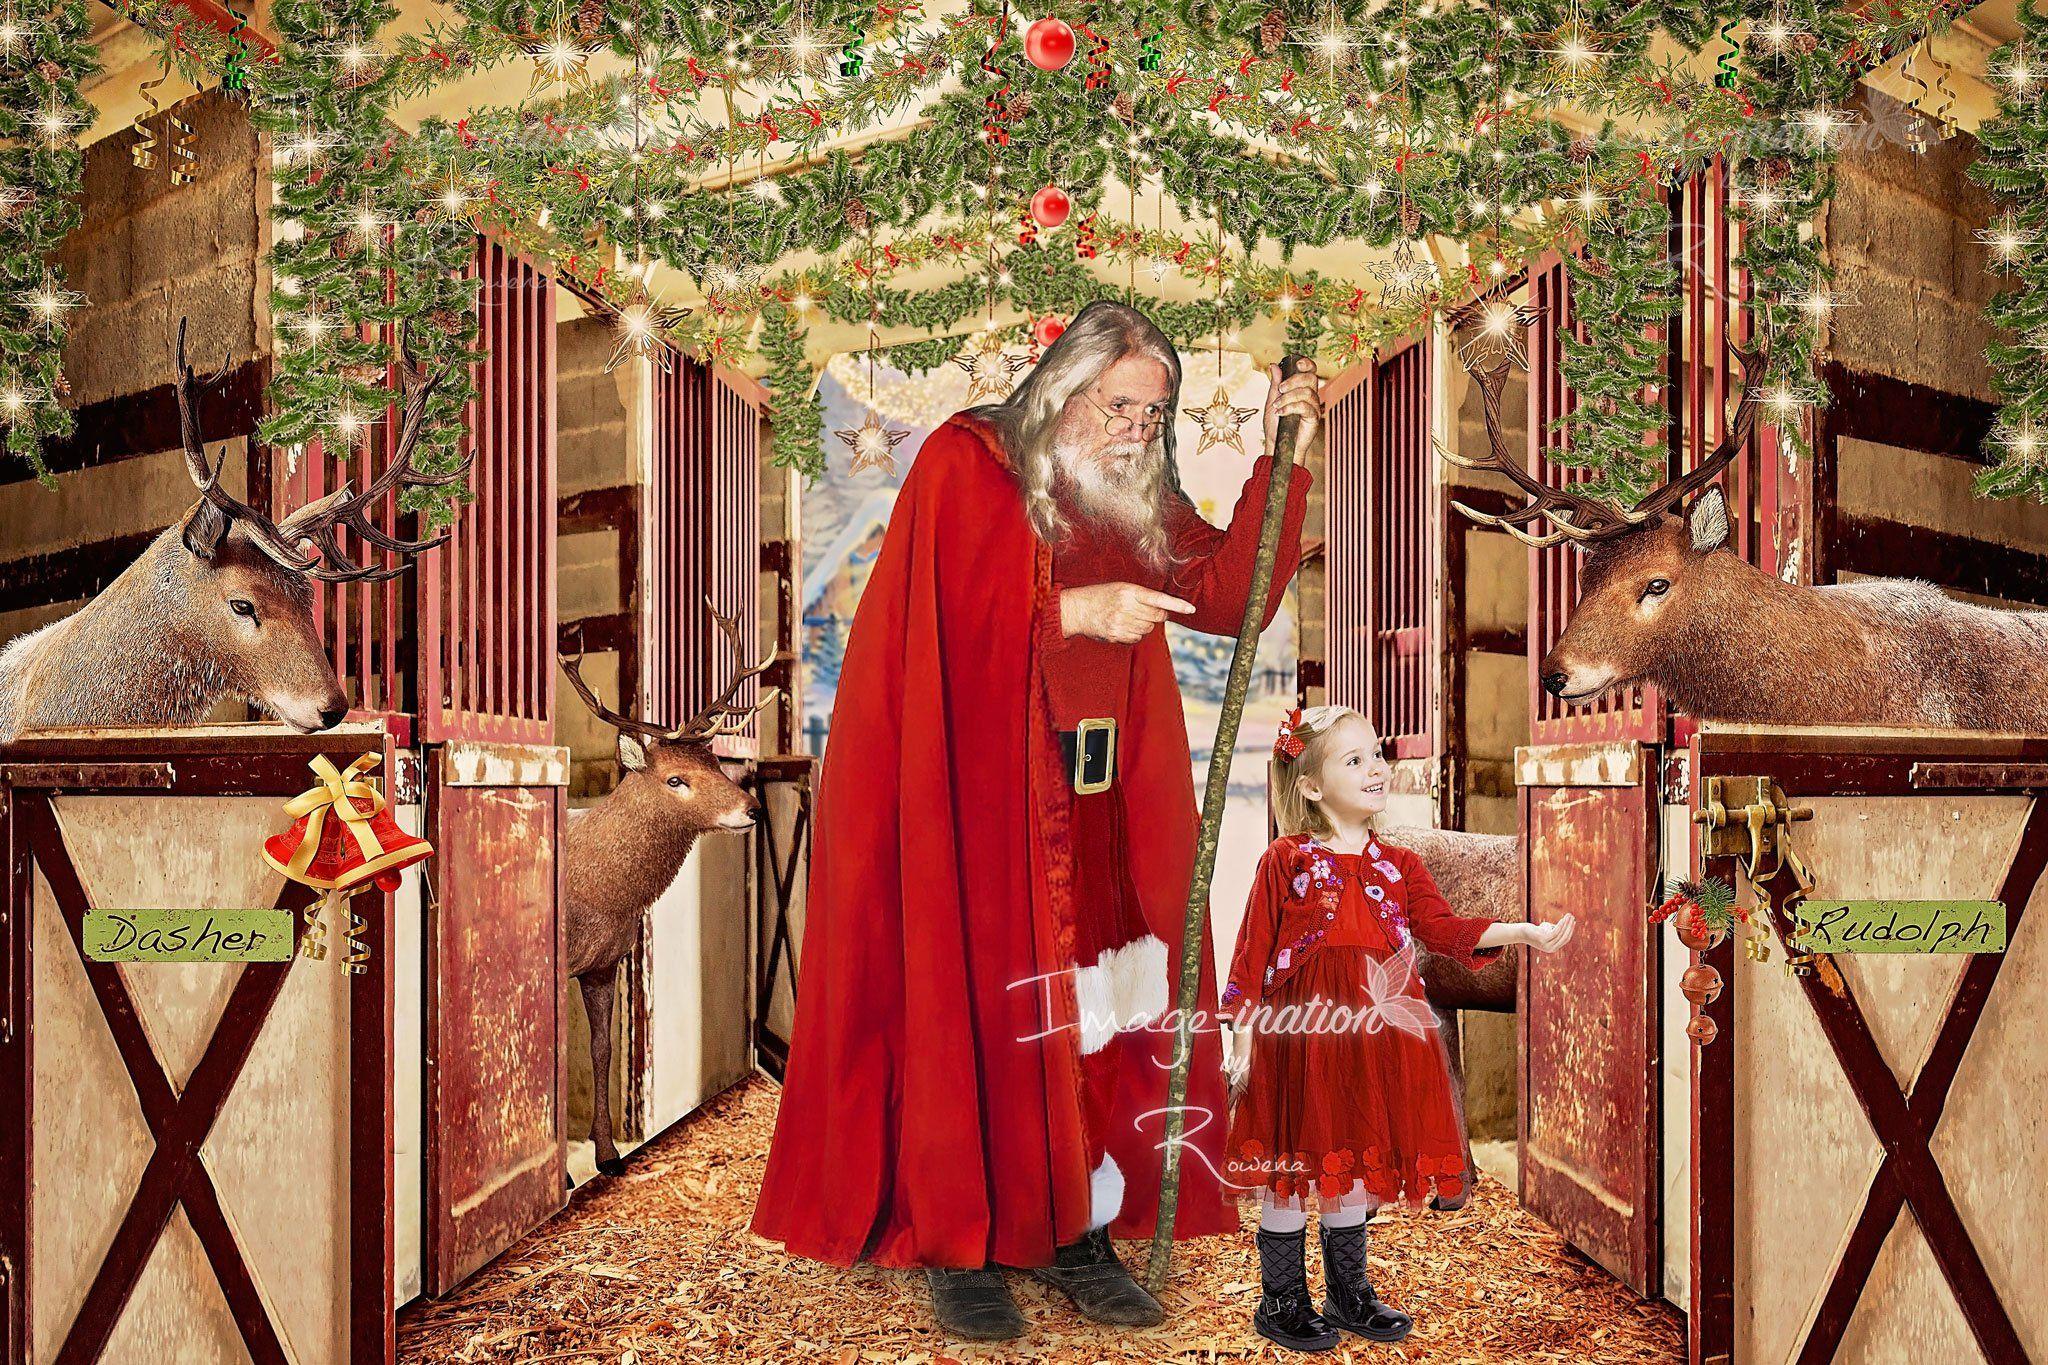 Santas Reindeer Barn 2 Versions Christmas Digital Background Digital Backdrop Composite Ar Digital Backdrops Santa And Reindeer Digital Art Supplies